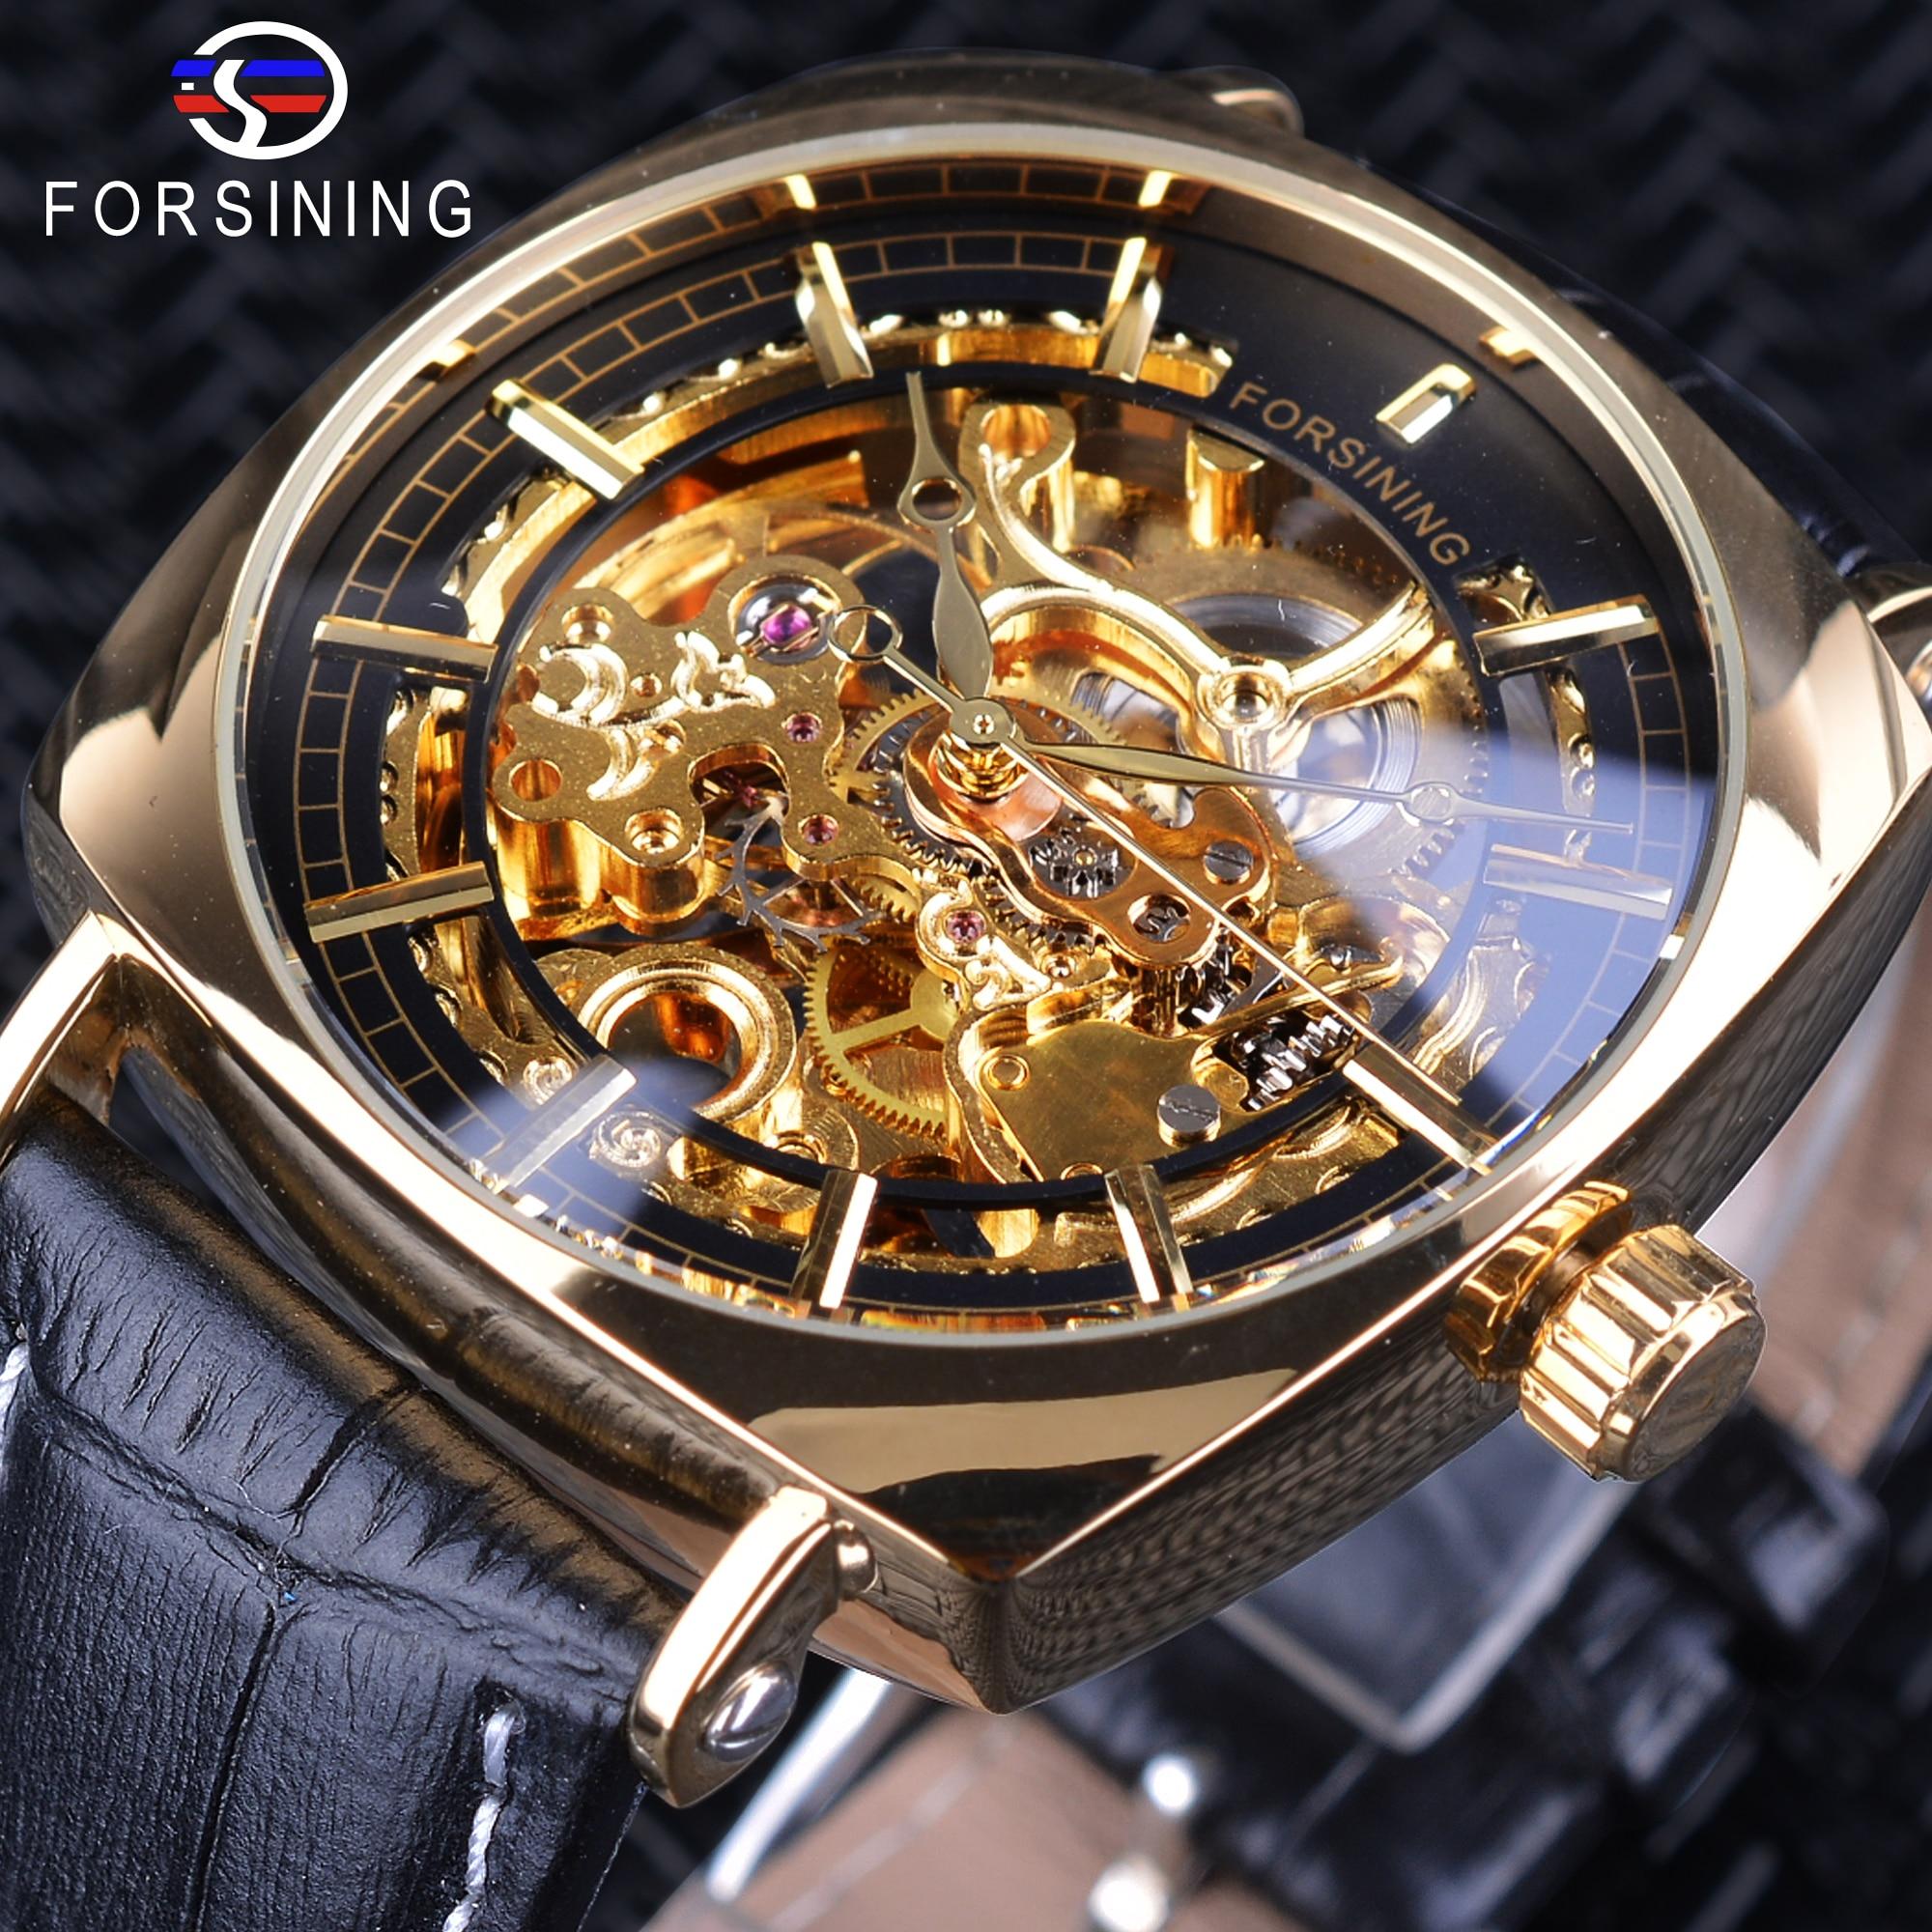 Forsining 2018 Creative Watch Waterproof Luxury Golden Skeleton Mechanical Watches Black Genuine Leather Mens Wristwatches Clock<br>